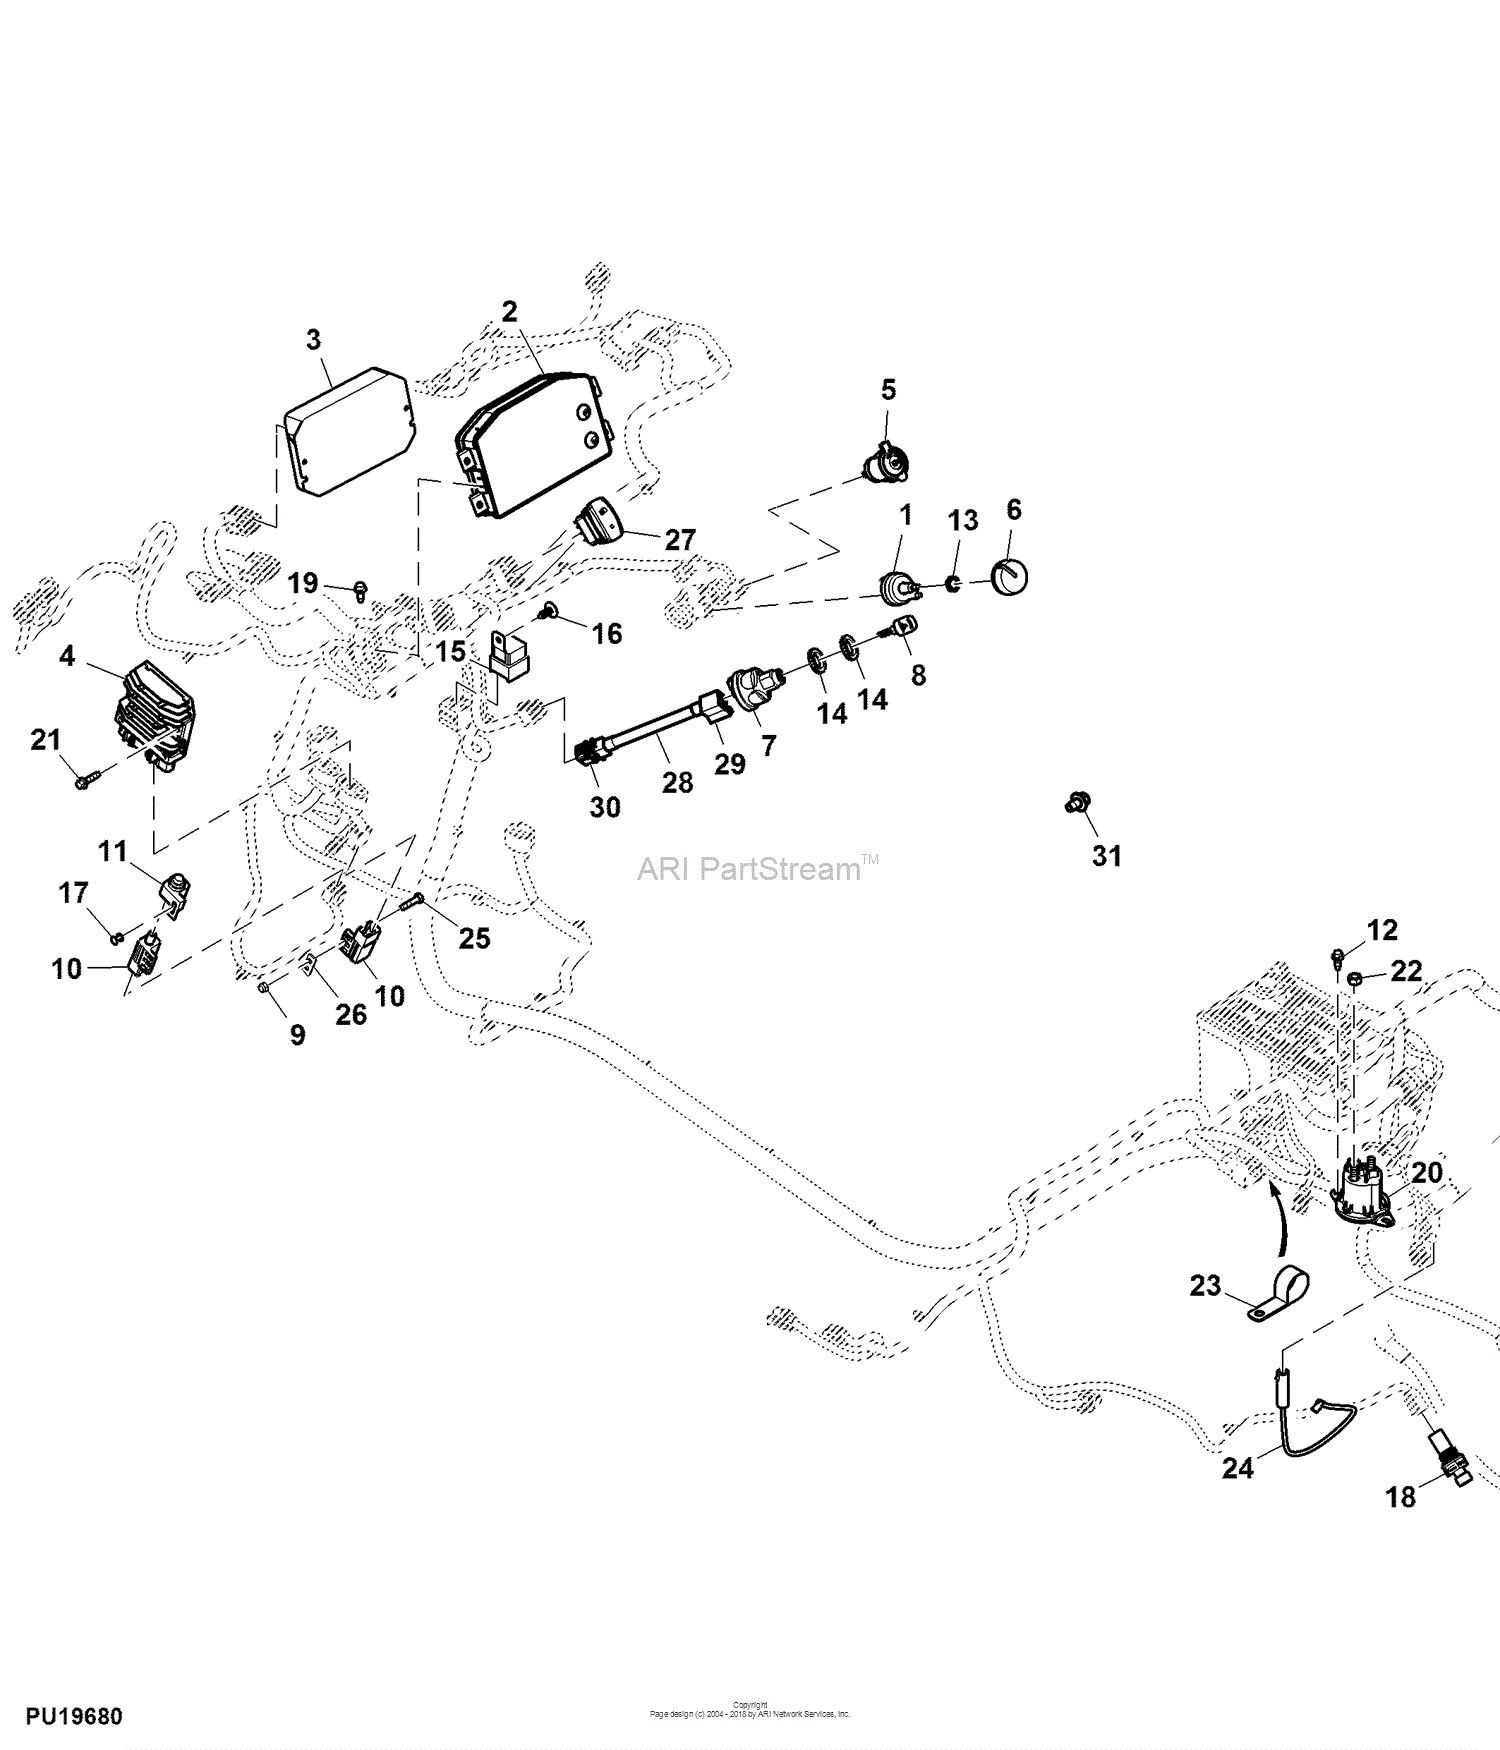 New Kraco Car Stereo Wiring Diagram Diagramsample